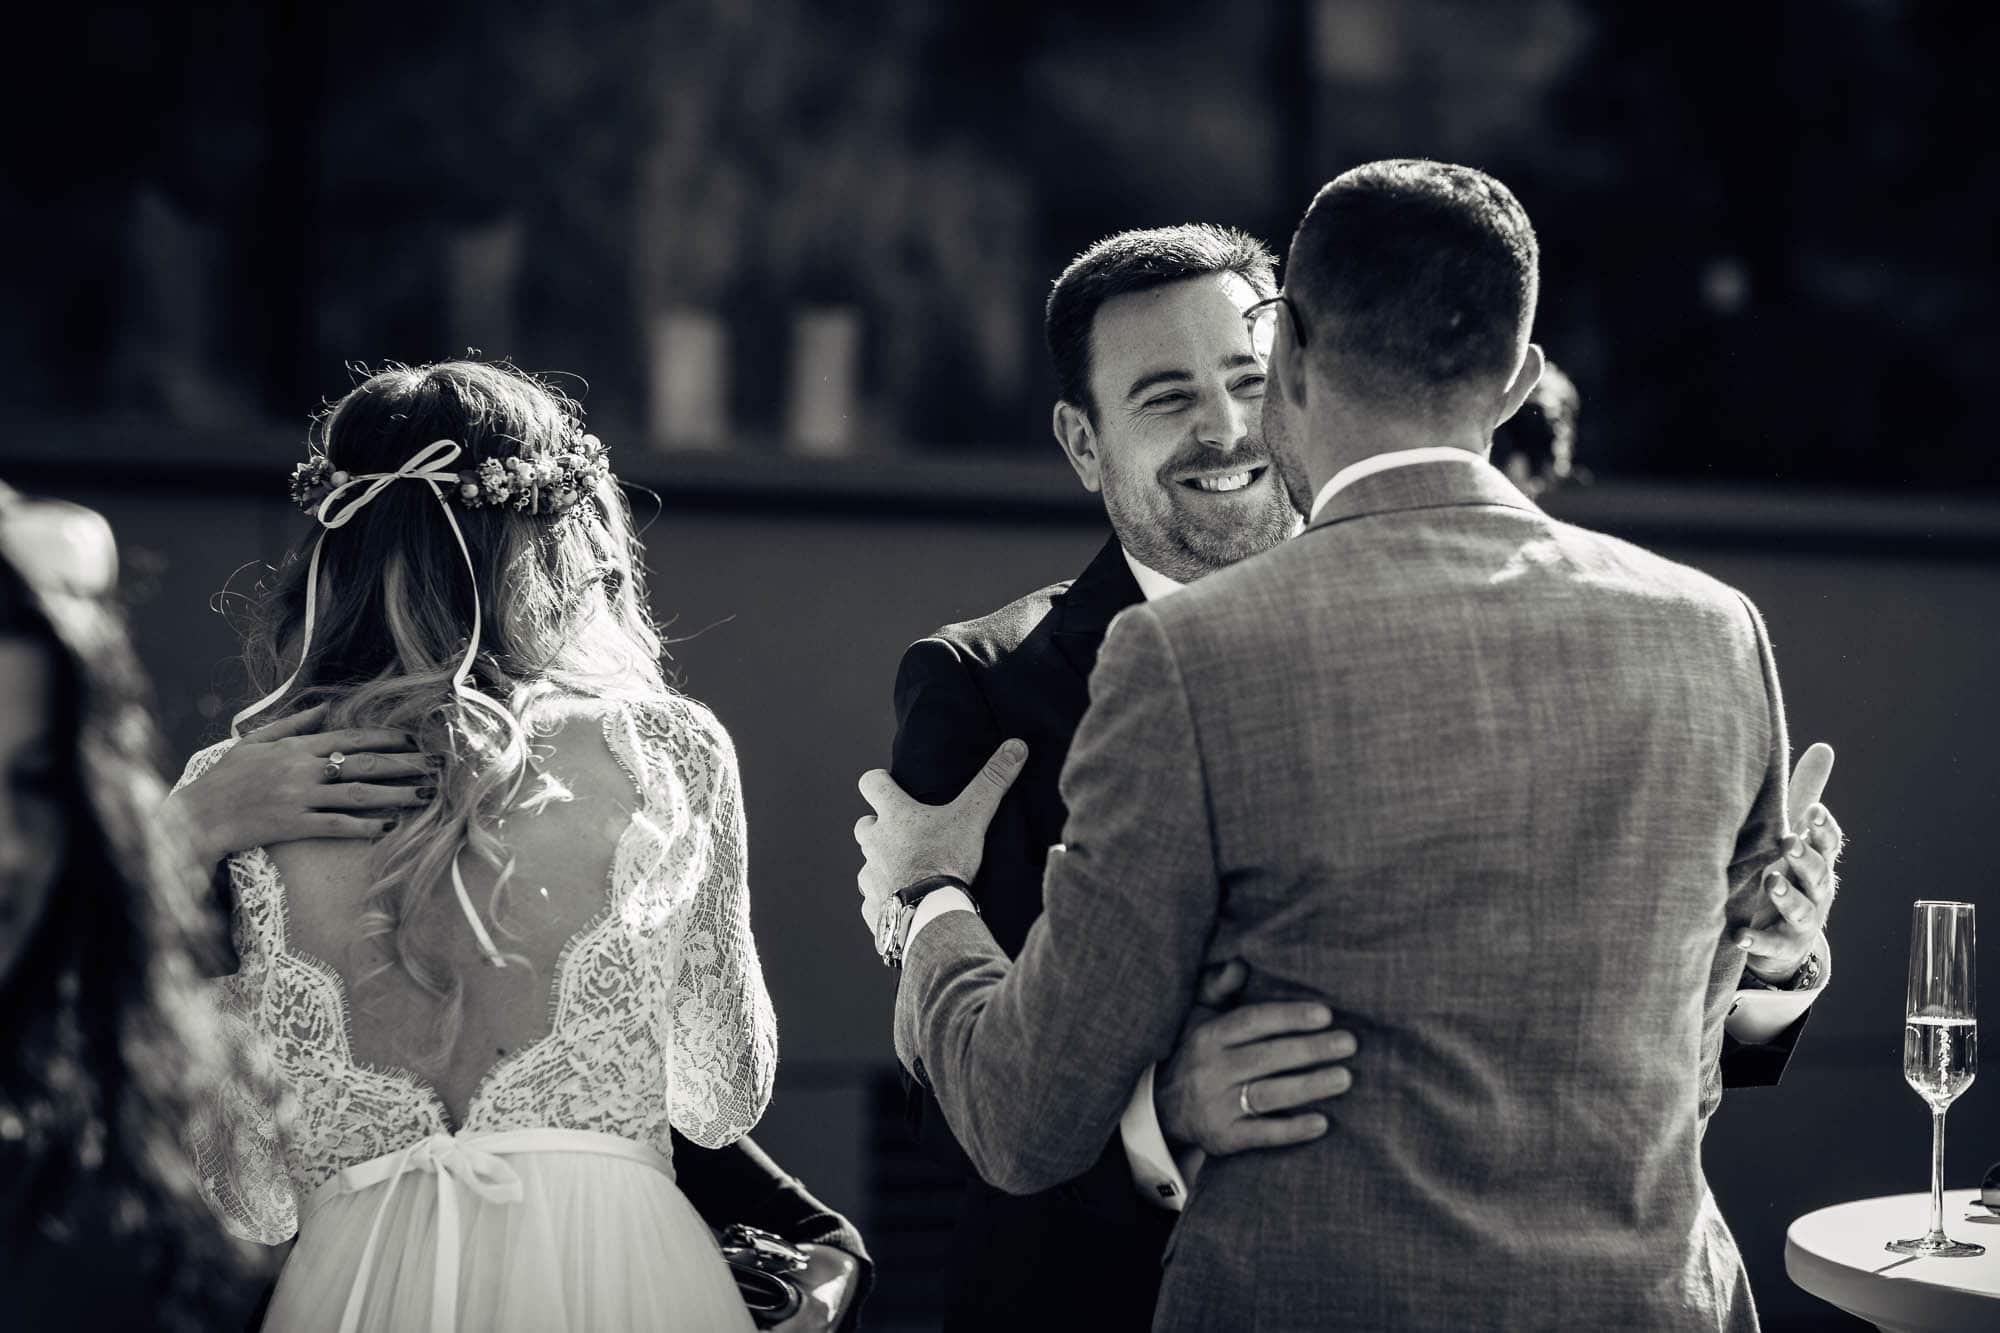 Trauzeuge gratuliert dem Bräutigam